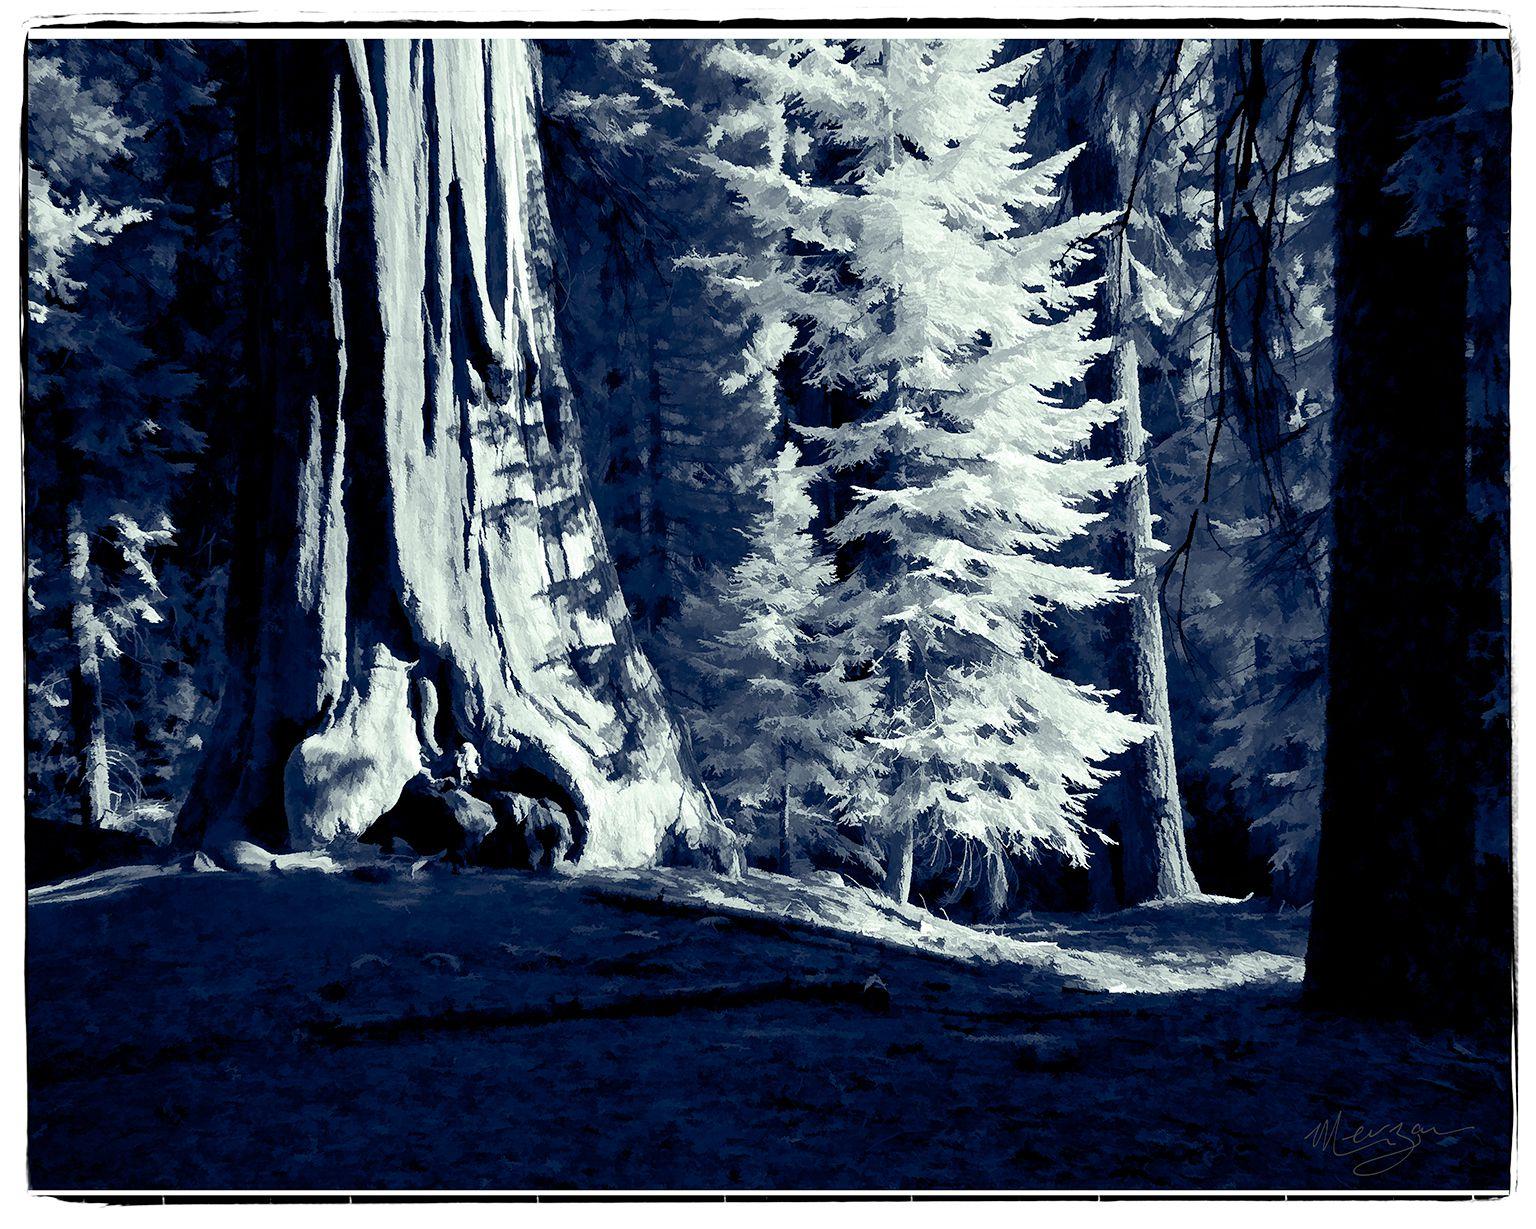 Redwood Forest Floor by Merzan